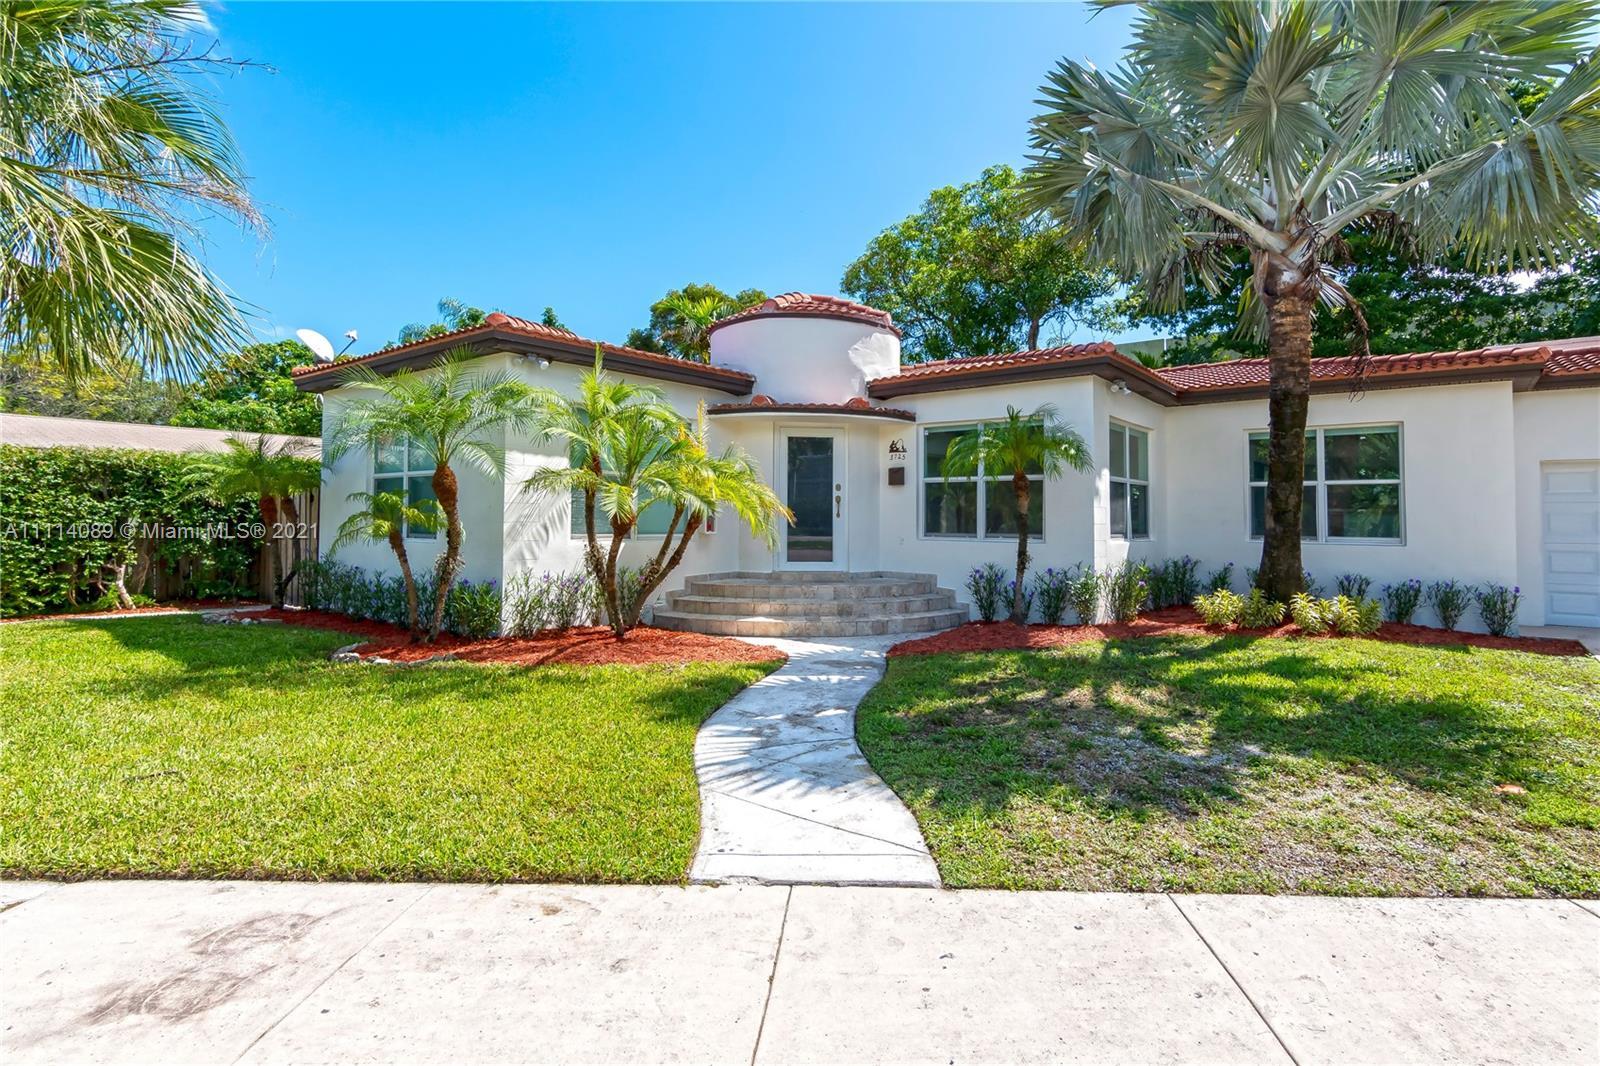 East Shenandoah - 3725 SW 1st Ave, Miami, FL 33145